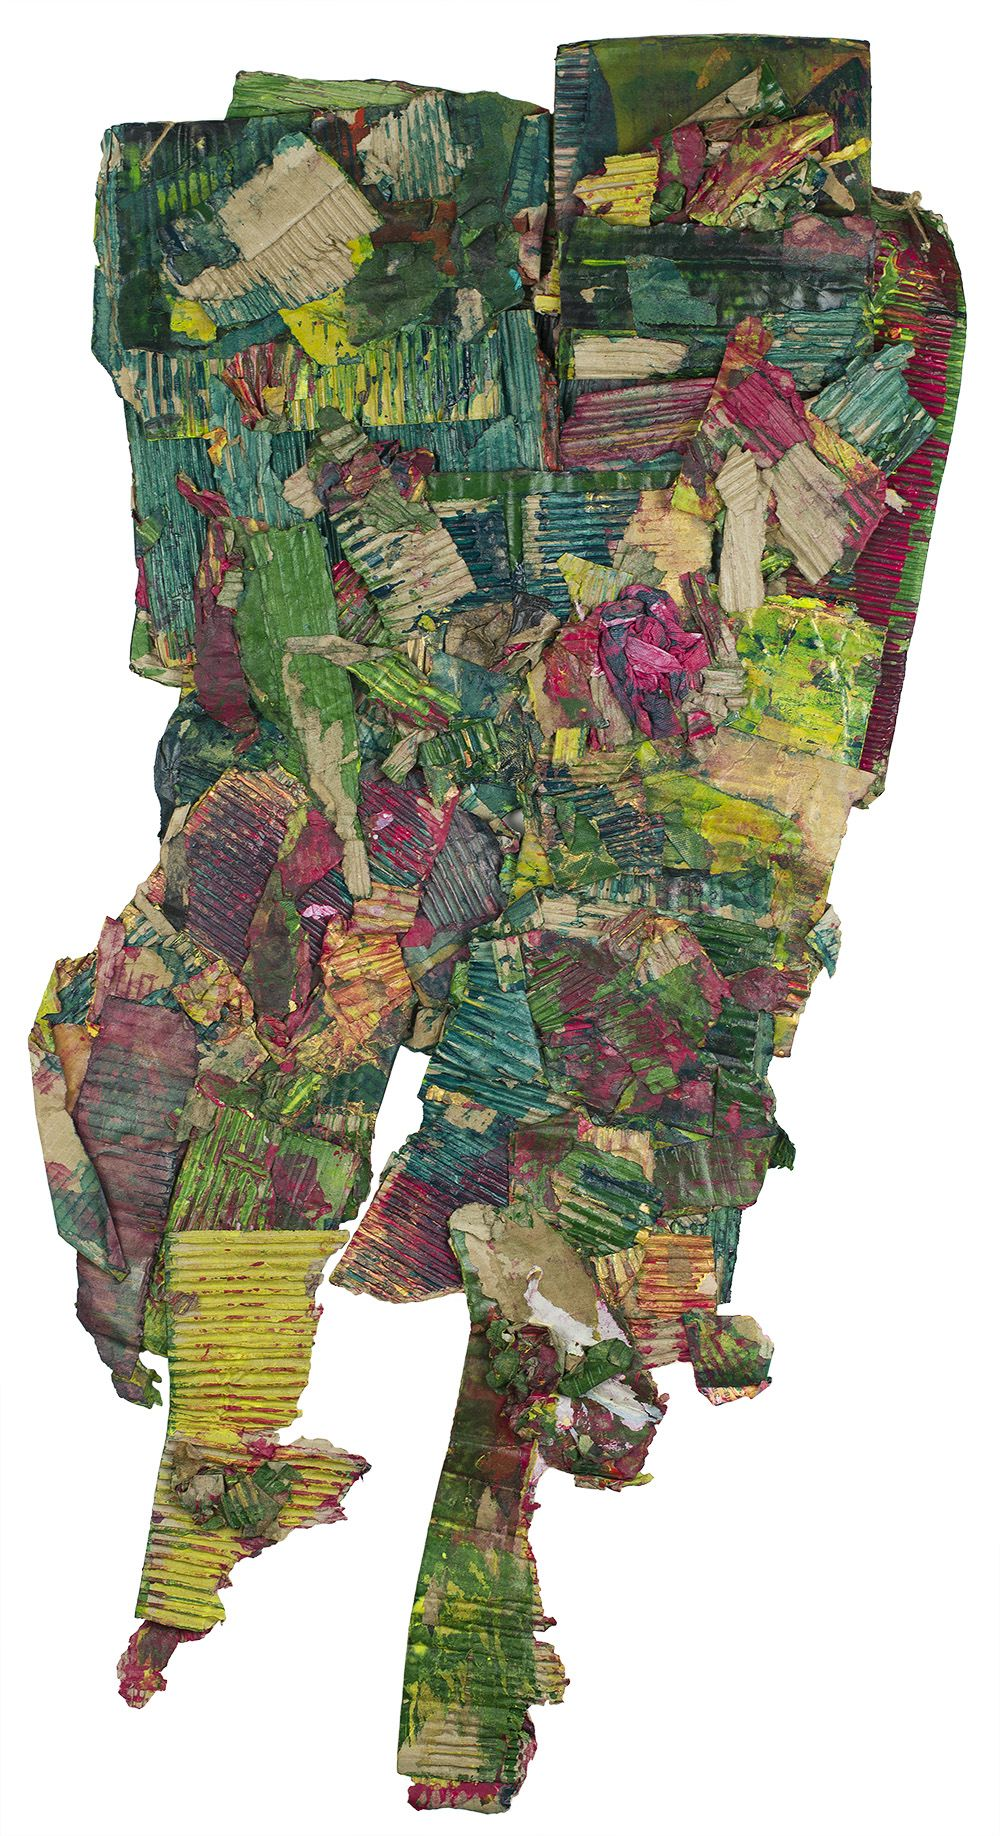 Katsuo Tokunaga    Plants  , 2015 Collage 48 x 20 inches 121.9 x 50.8 cm KaT 1